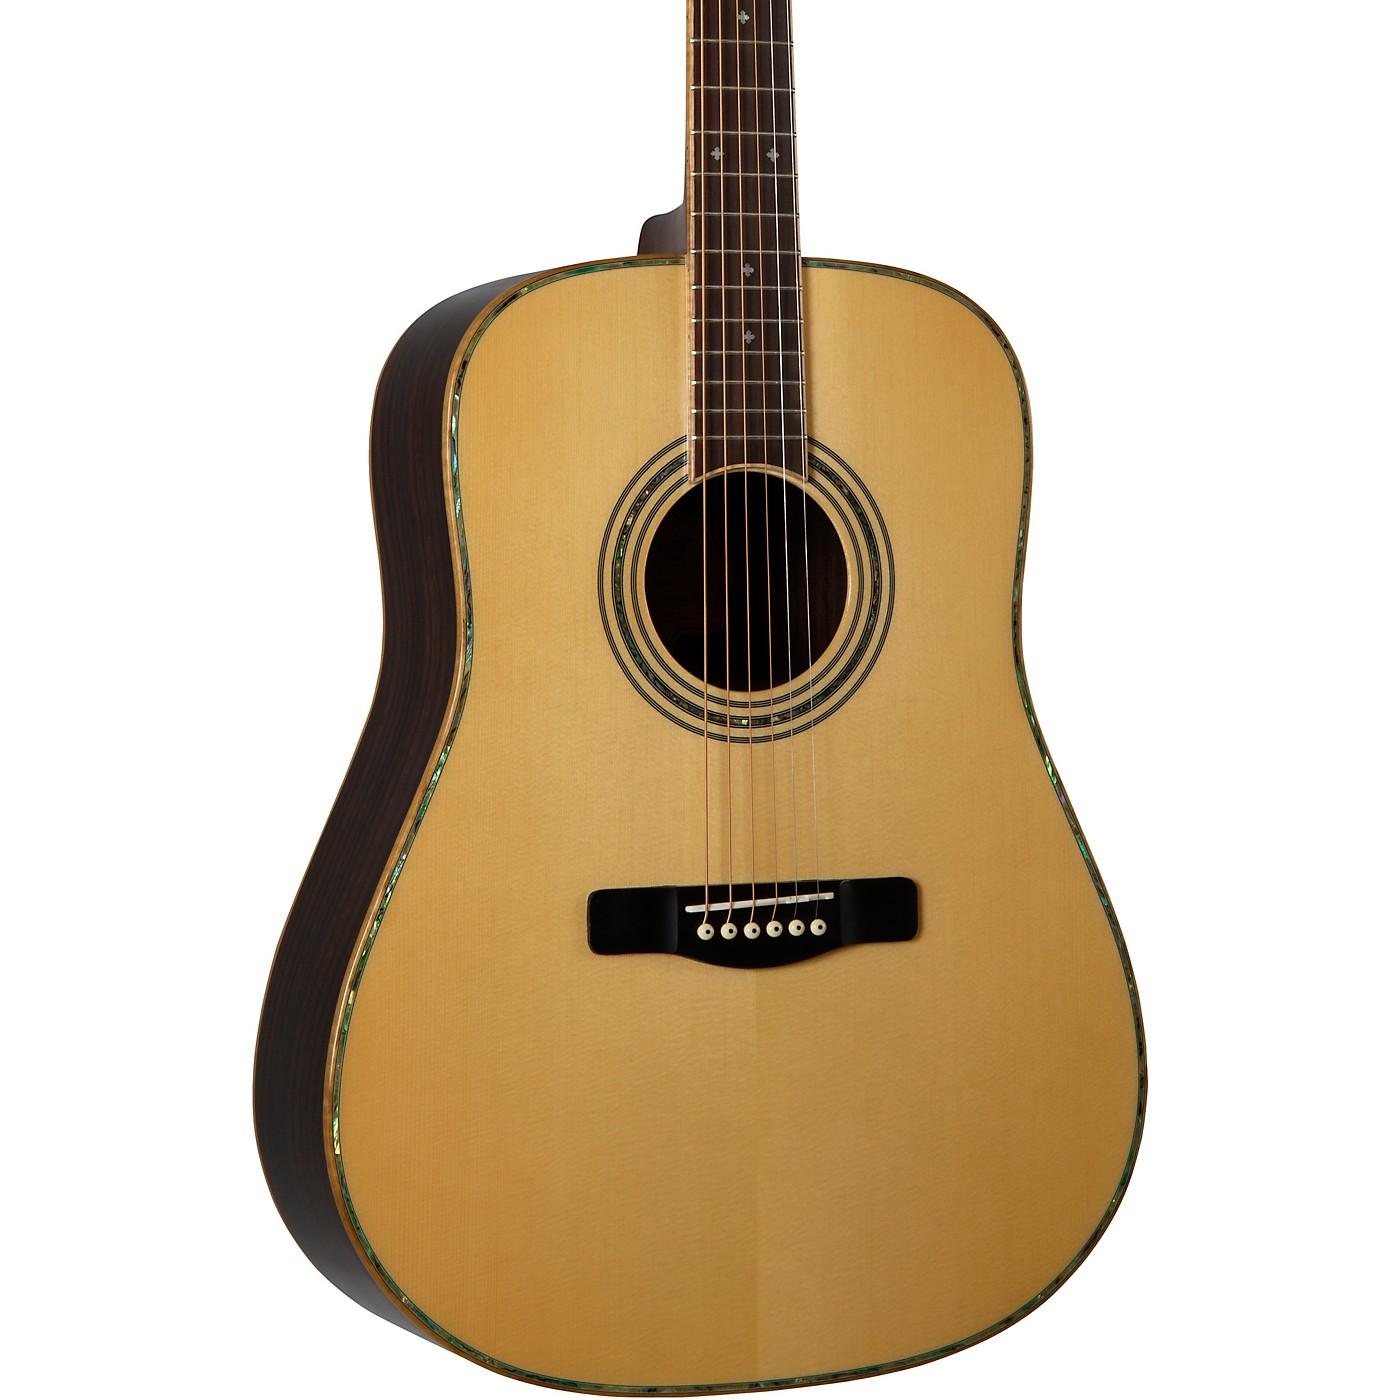 Greg Bennett Design by Samick ASDR Dreadnaught Solid Spruce Top Acoustic Guitar thumbnail